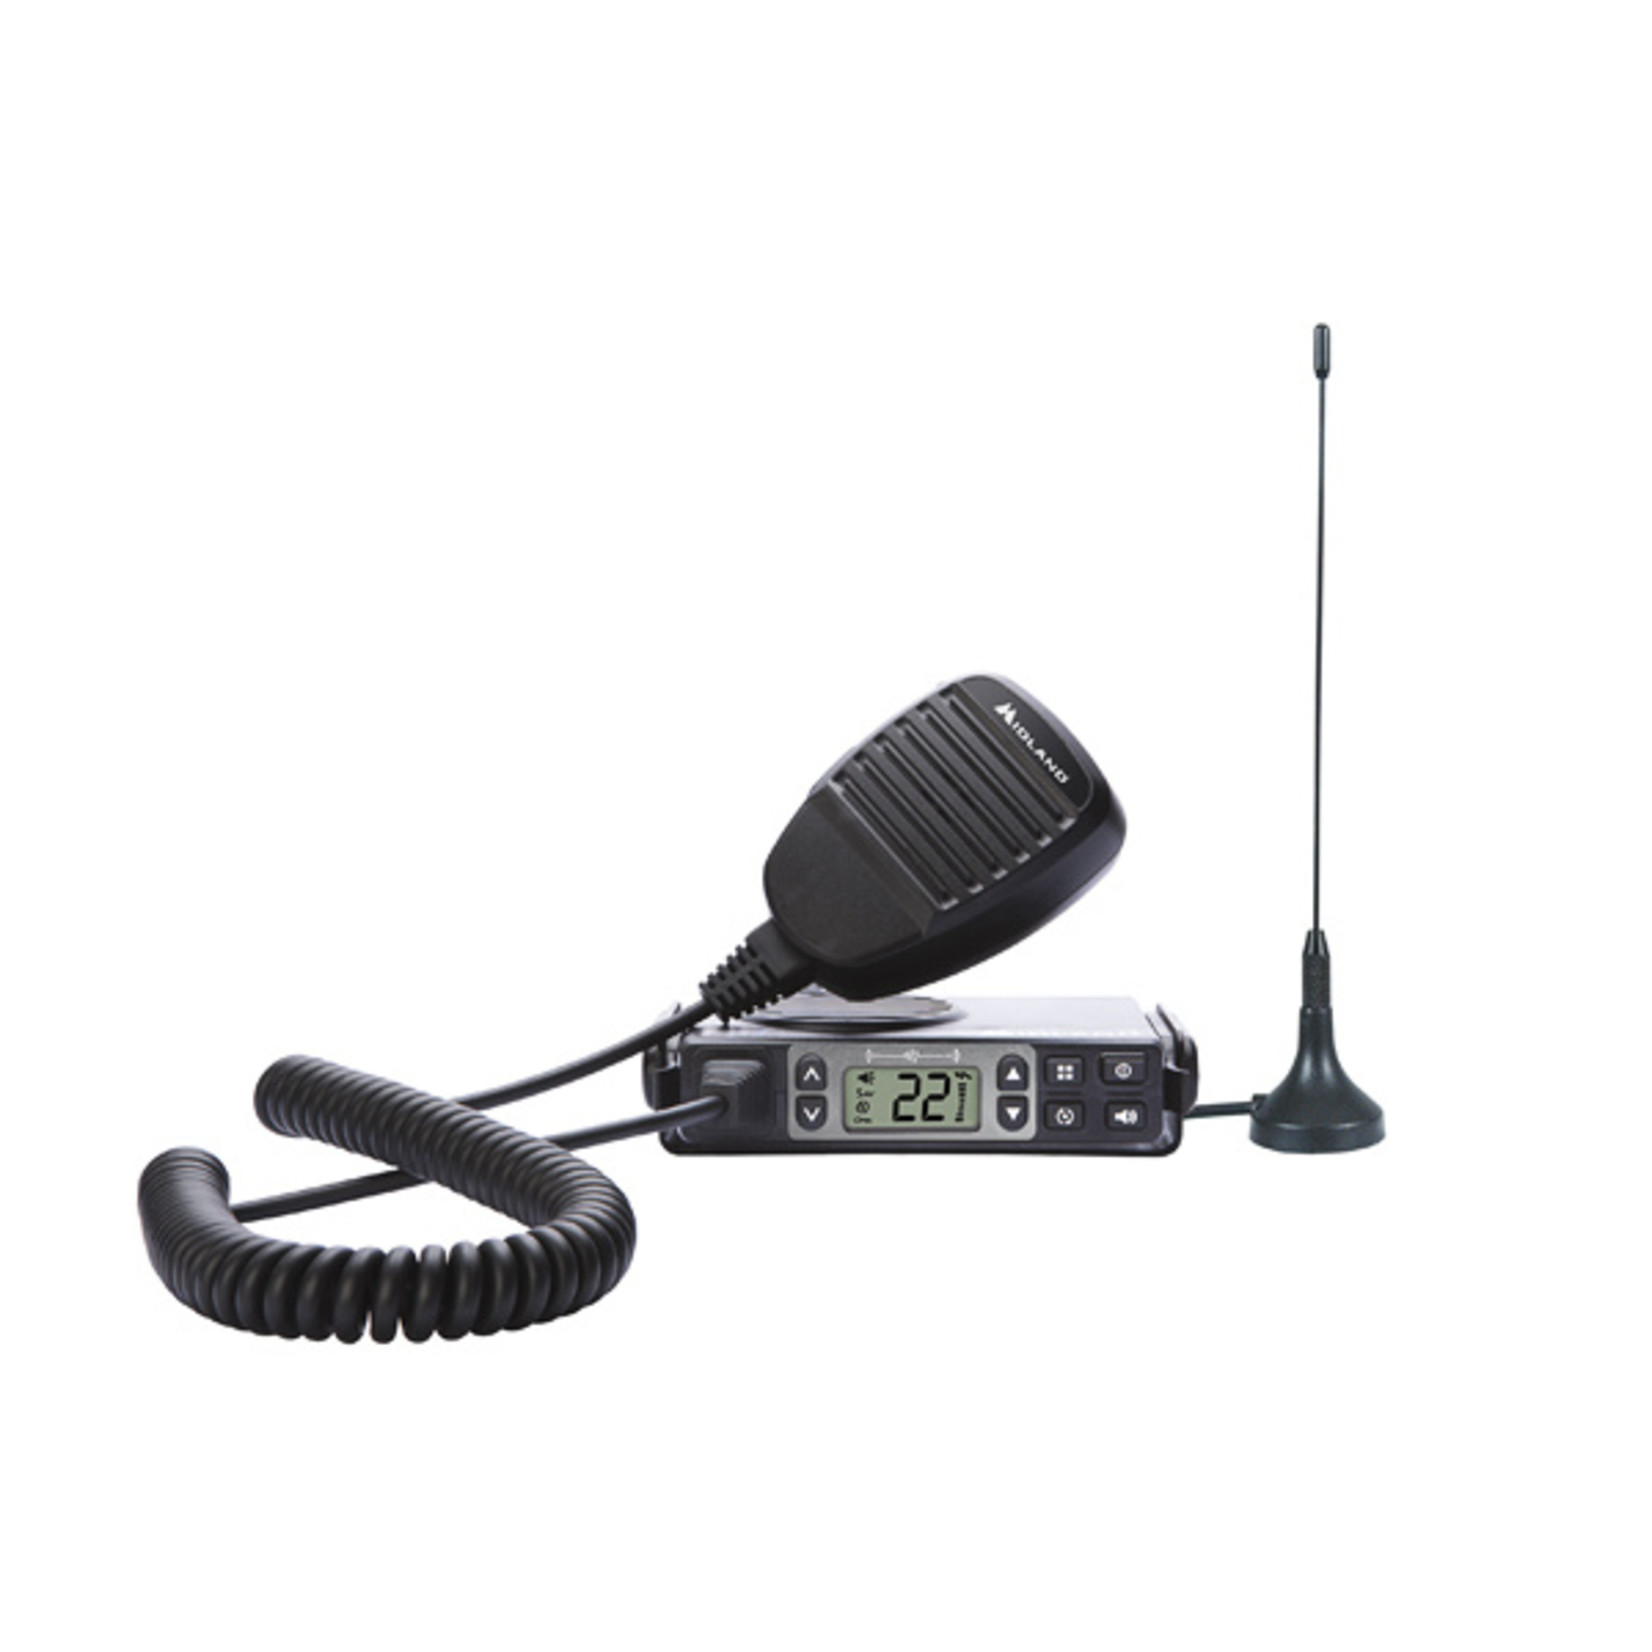 Midland Midland MicroMobile MXT105 Two-Way Radio